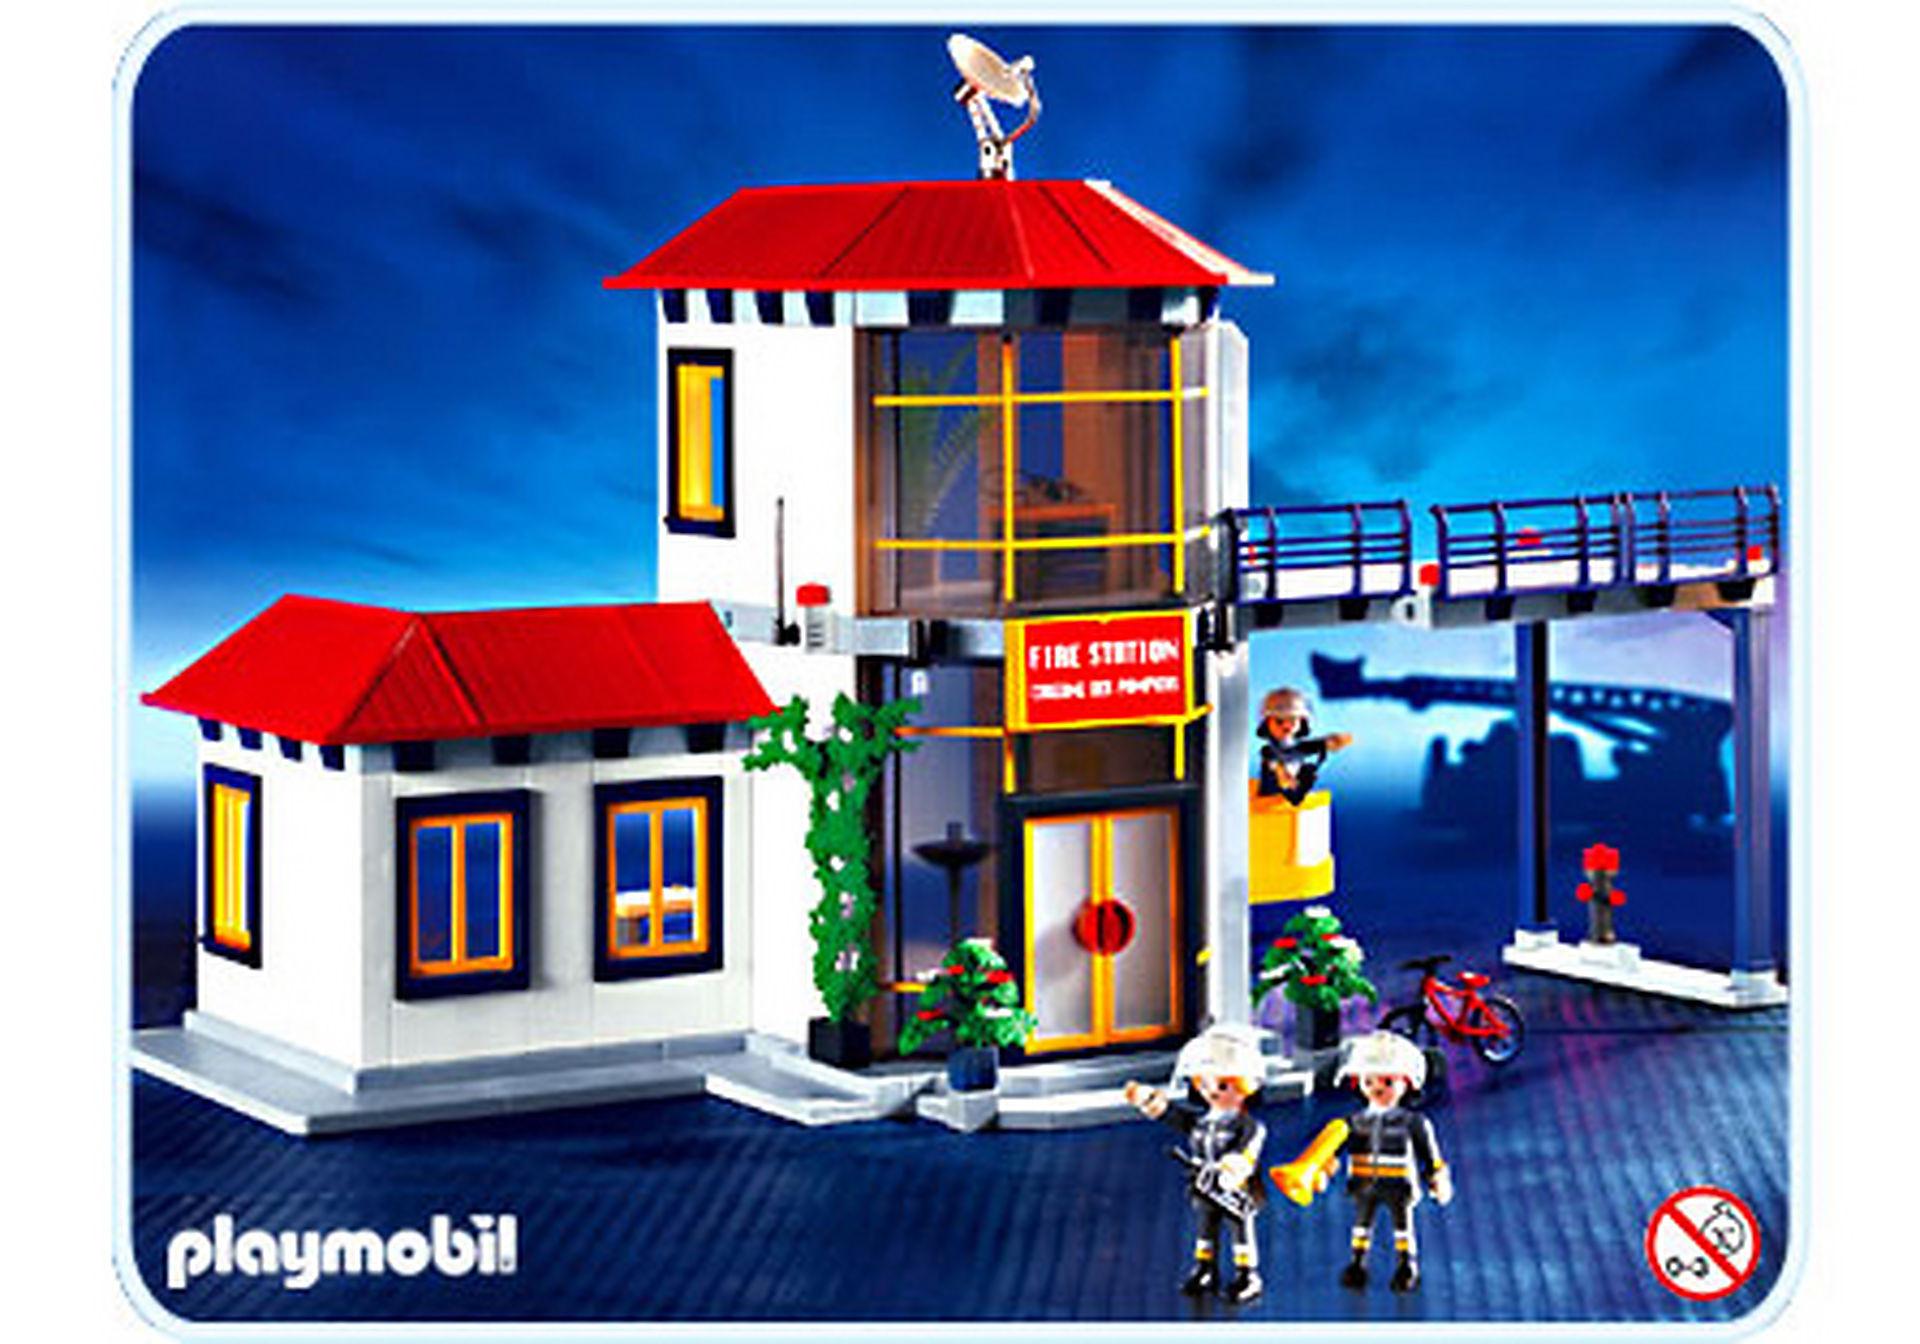 http://media.playmobil.com/i/playmobil/3175-A_product_detail/Pompiers/caserne des pompiers